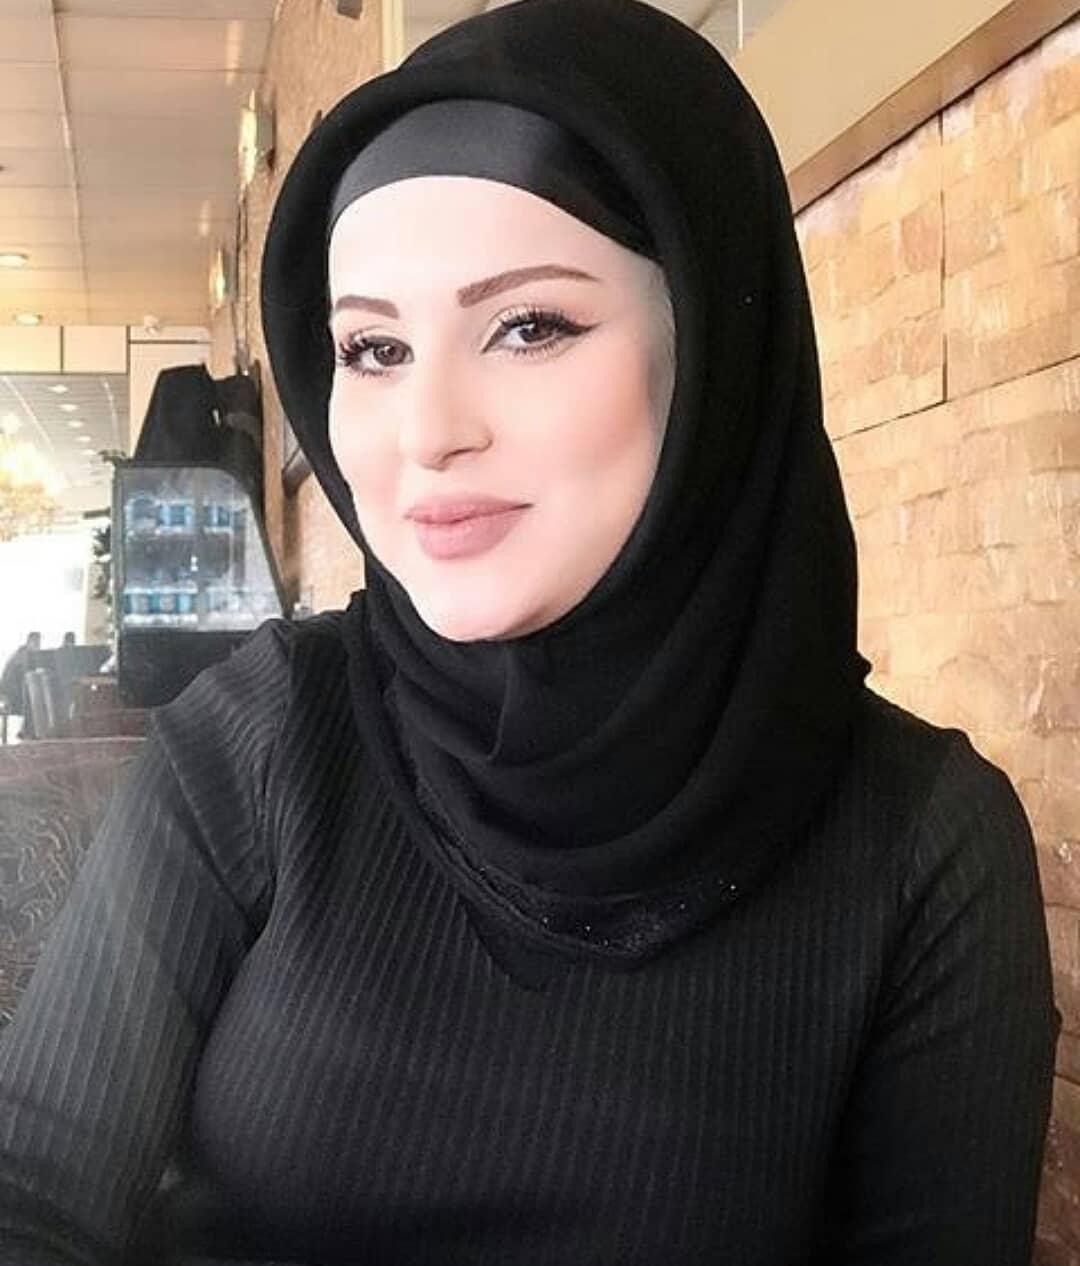 بالصور صور بنات محجبات 2019 , اجمل بروفيل لعاشقات الحجاب 1032 1